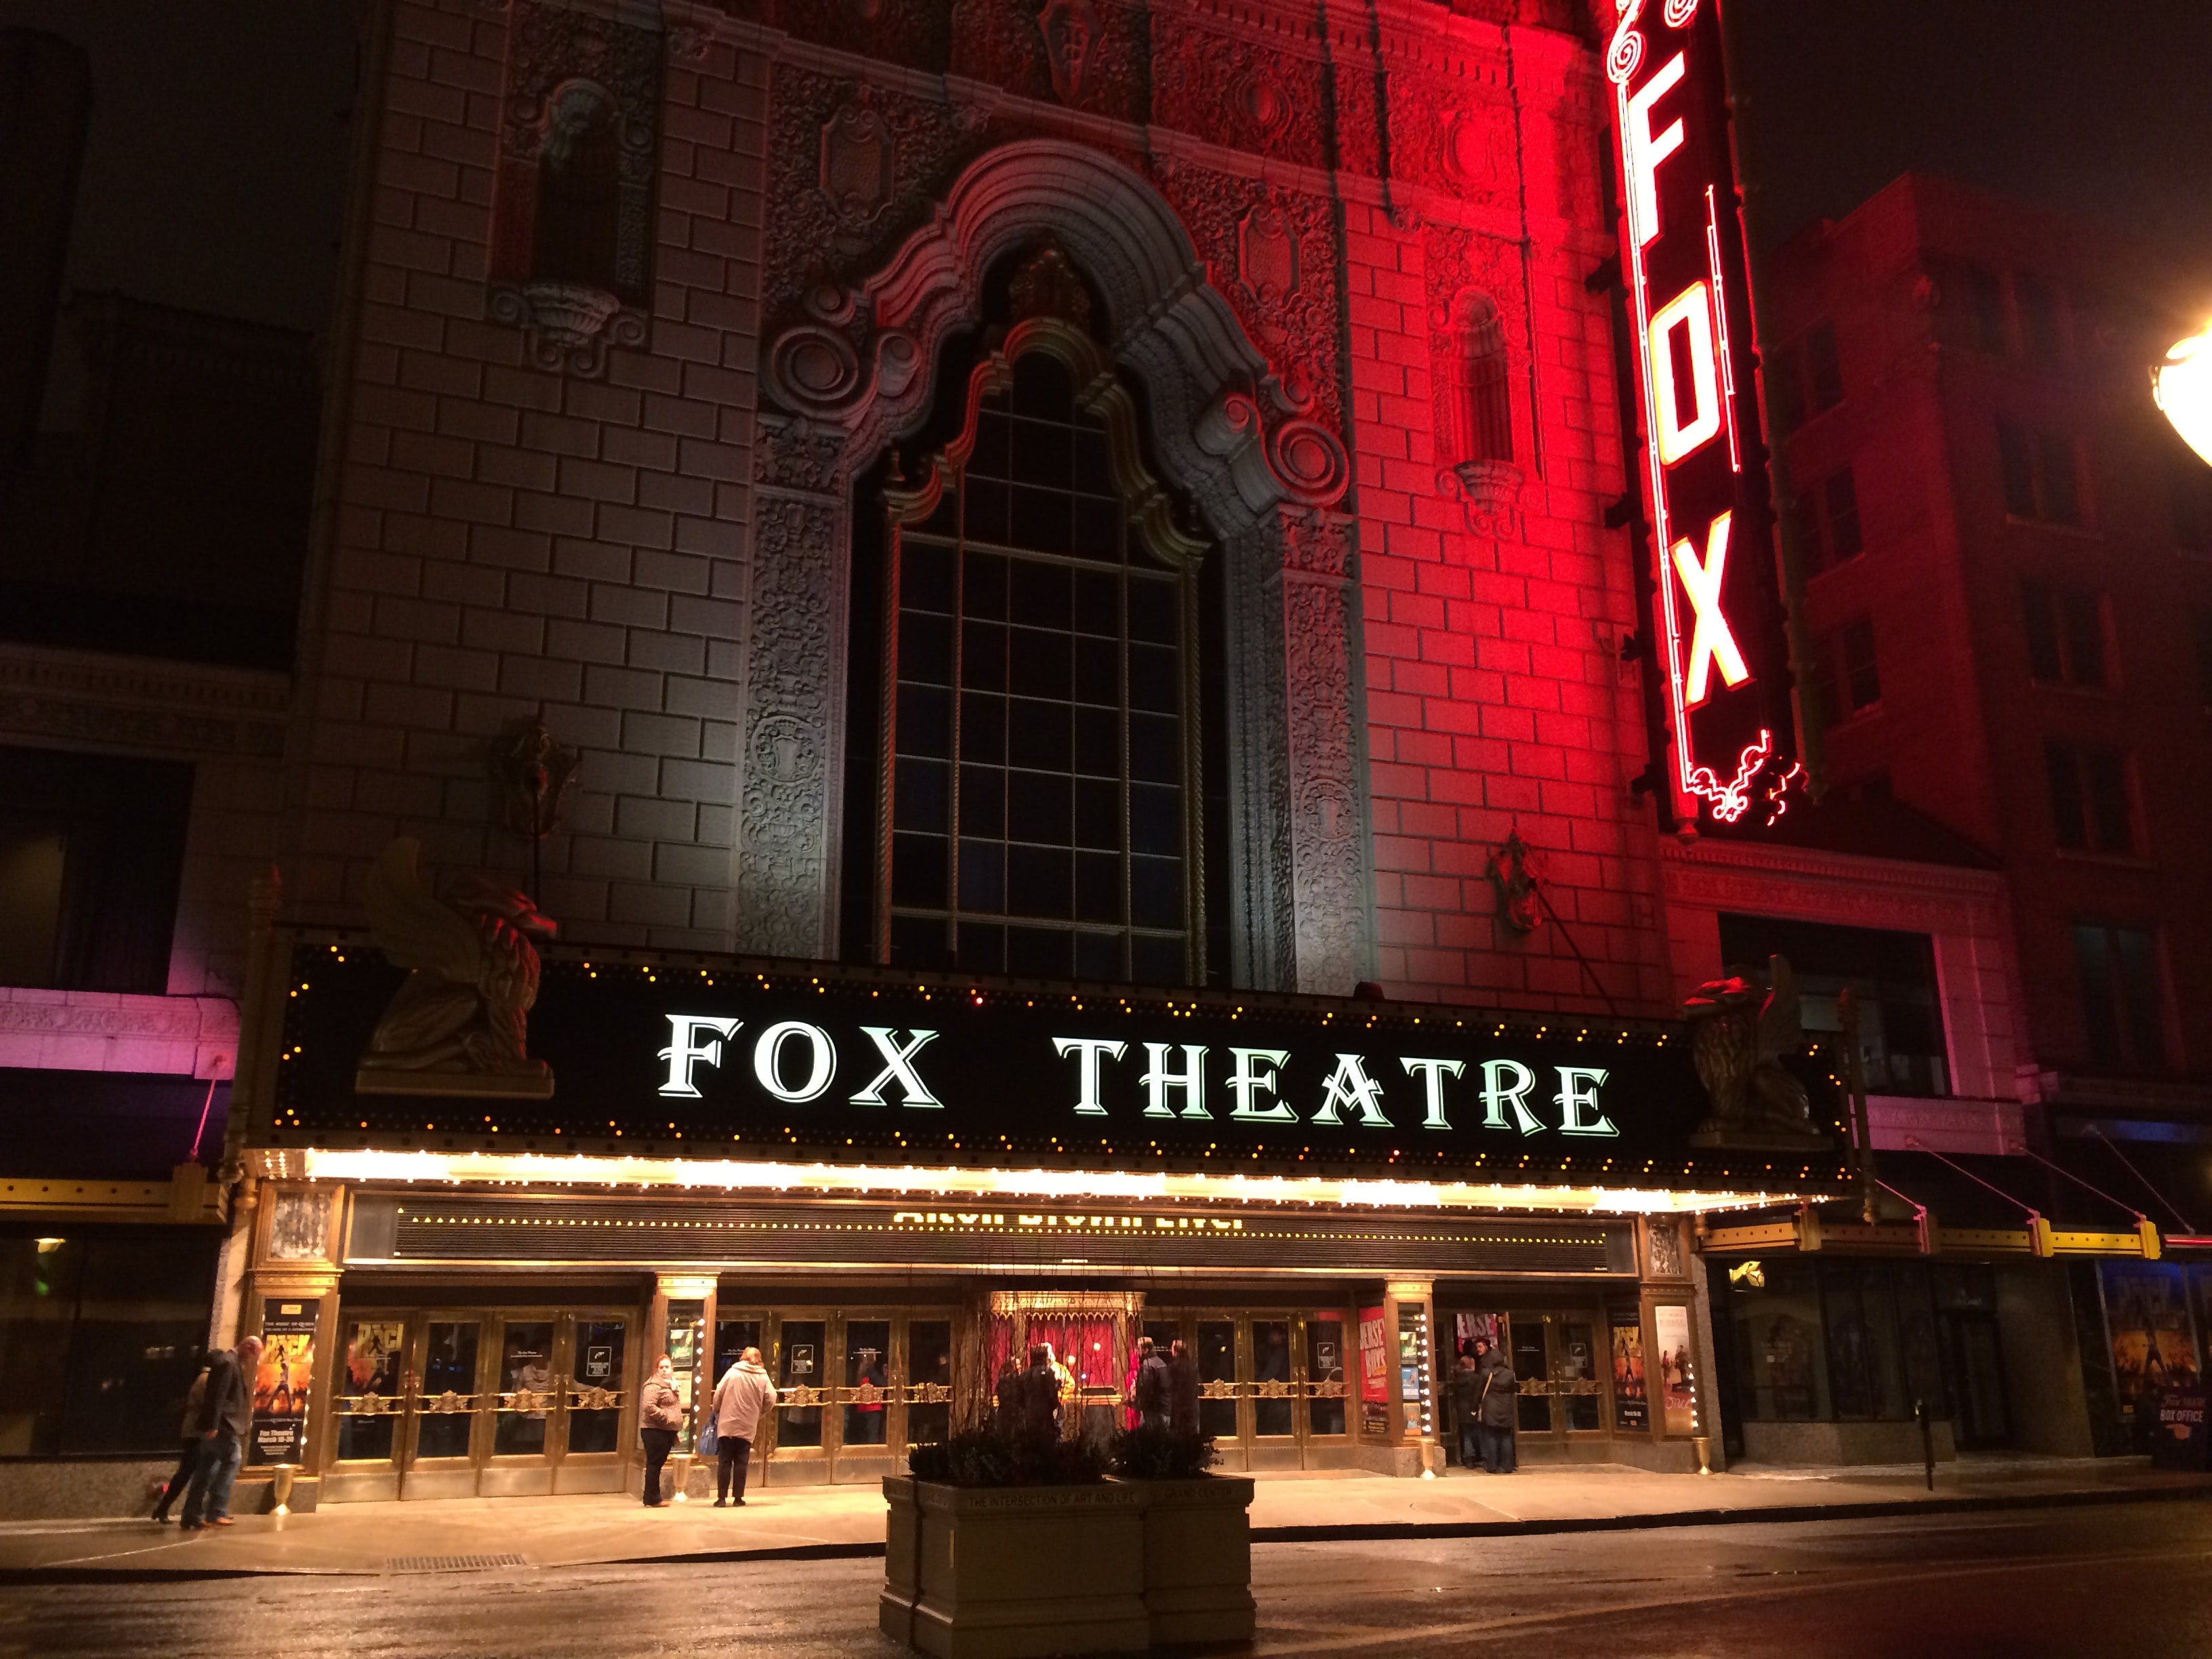 Fox Theatre at nighttime